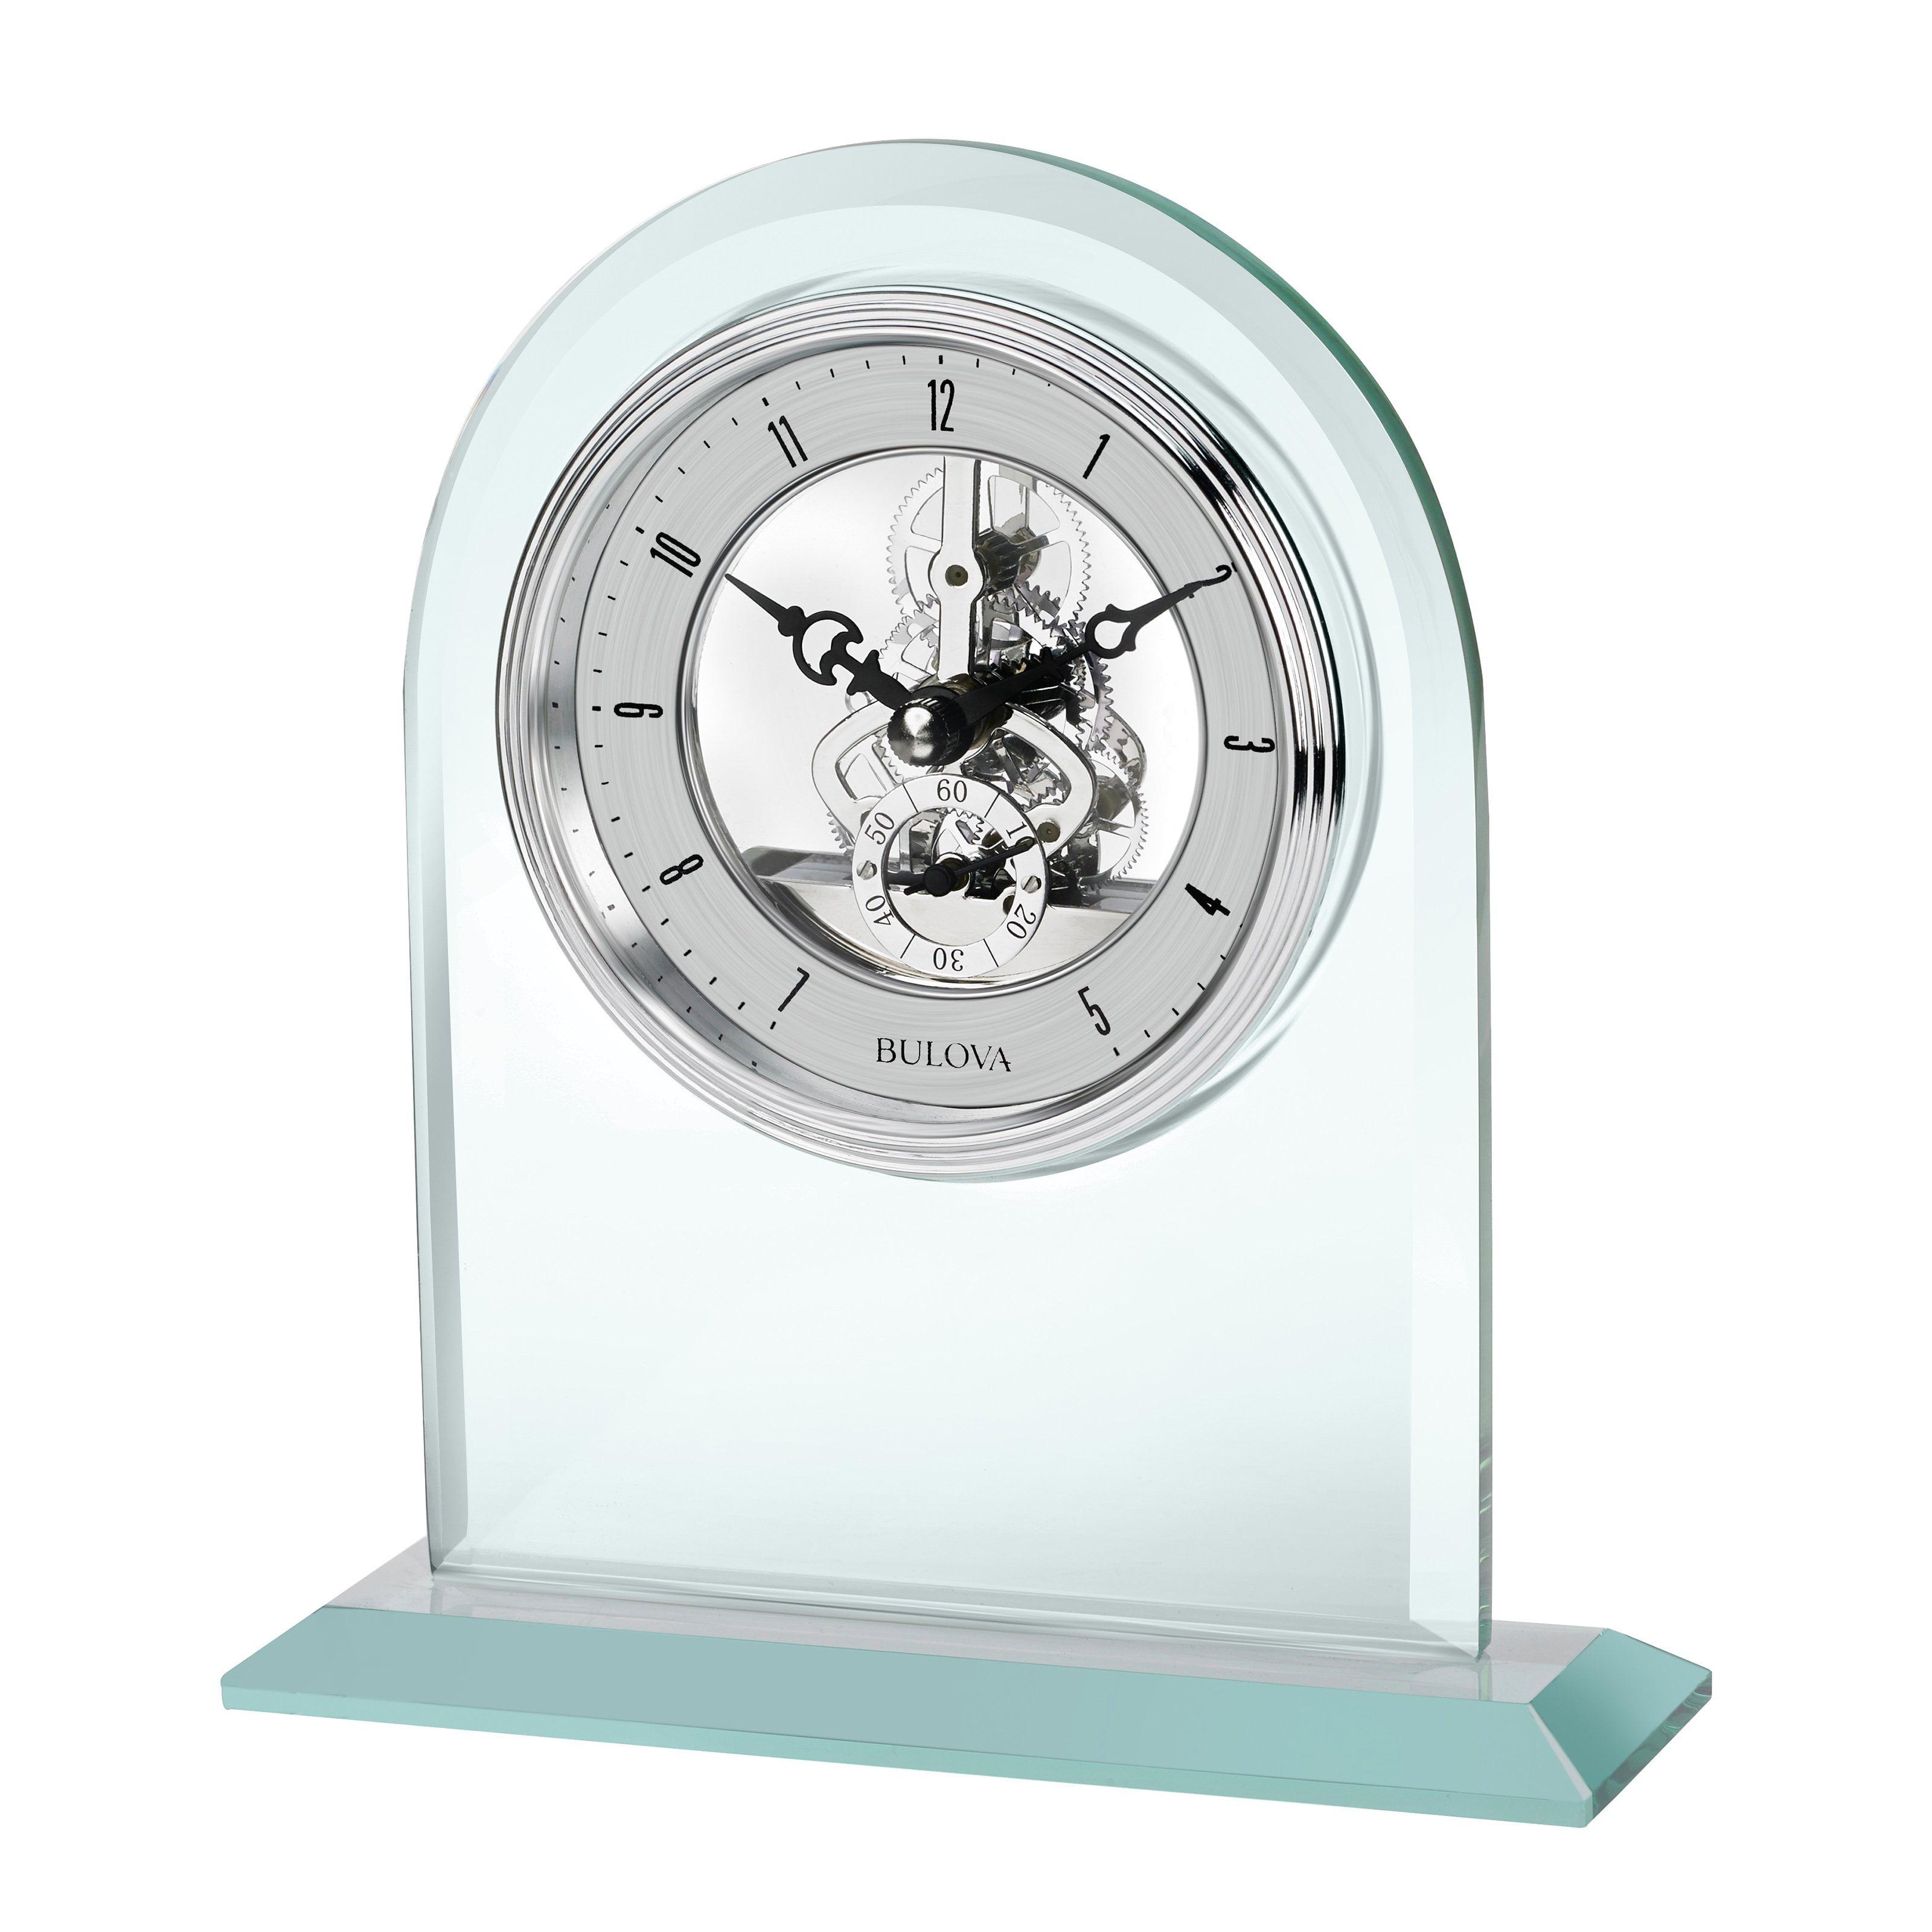 Bulova Clarity Desk Clock by Bulova